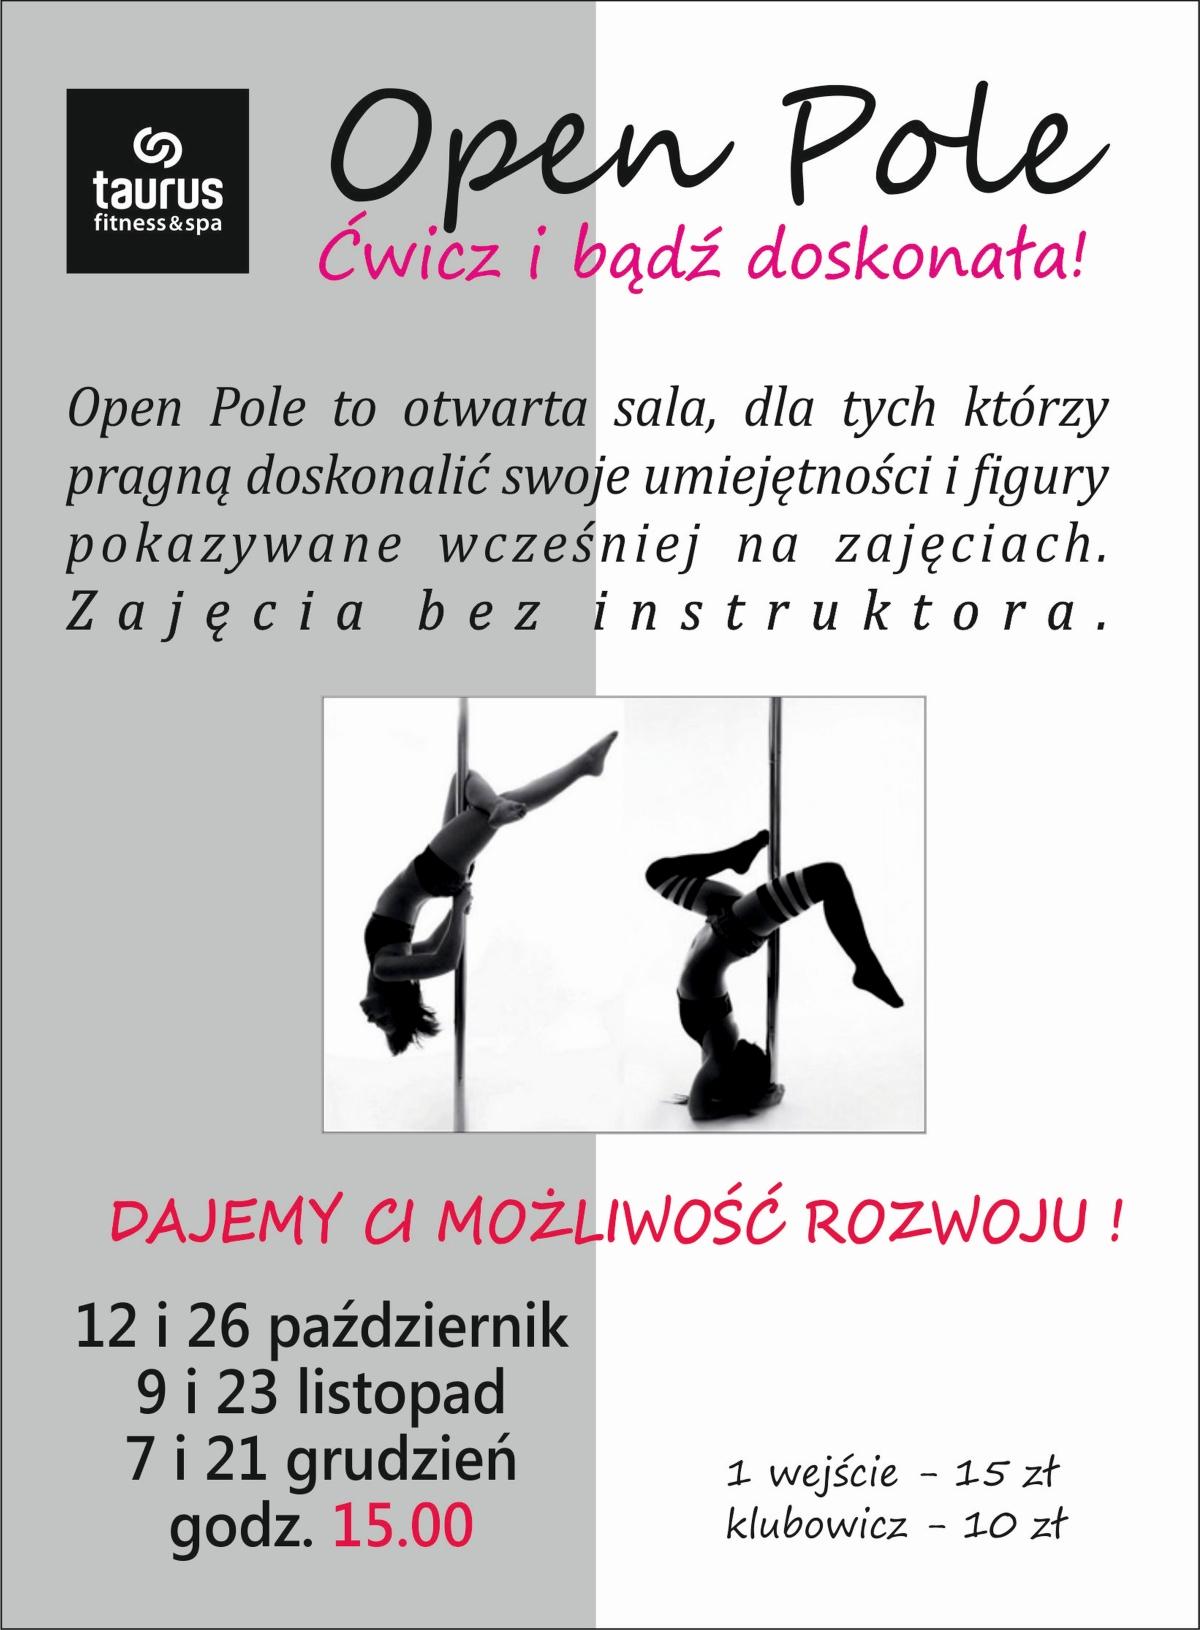 Open Pole - otwarta sala!